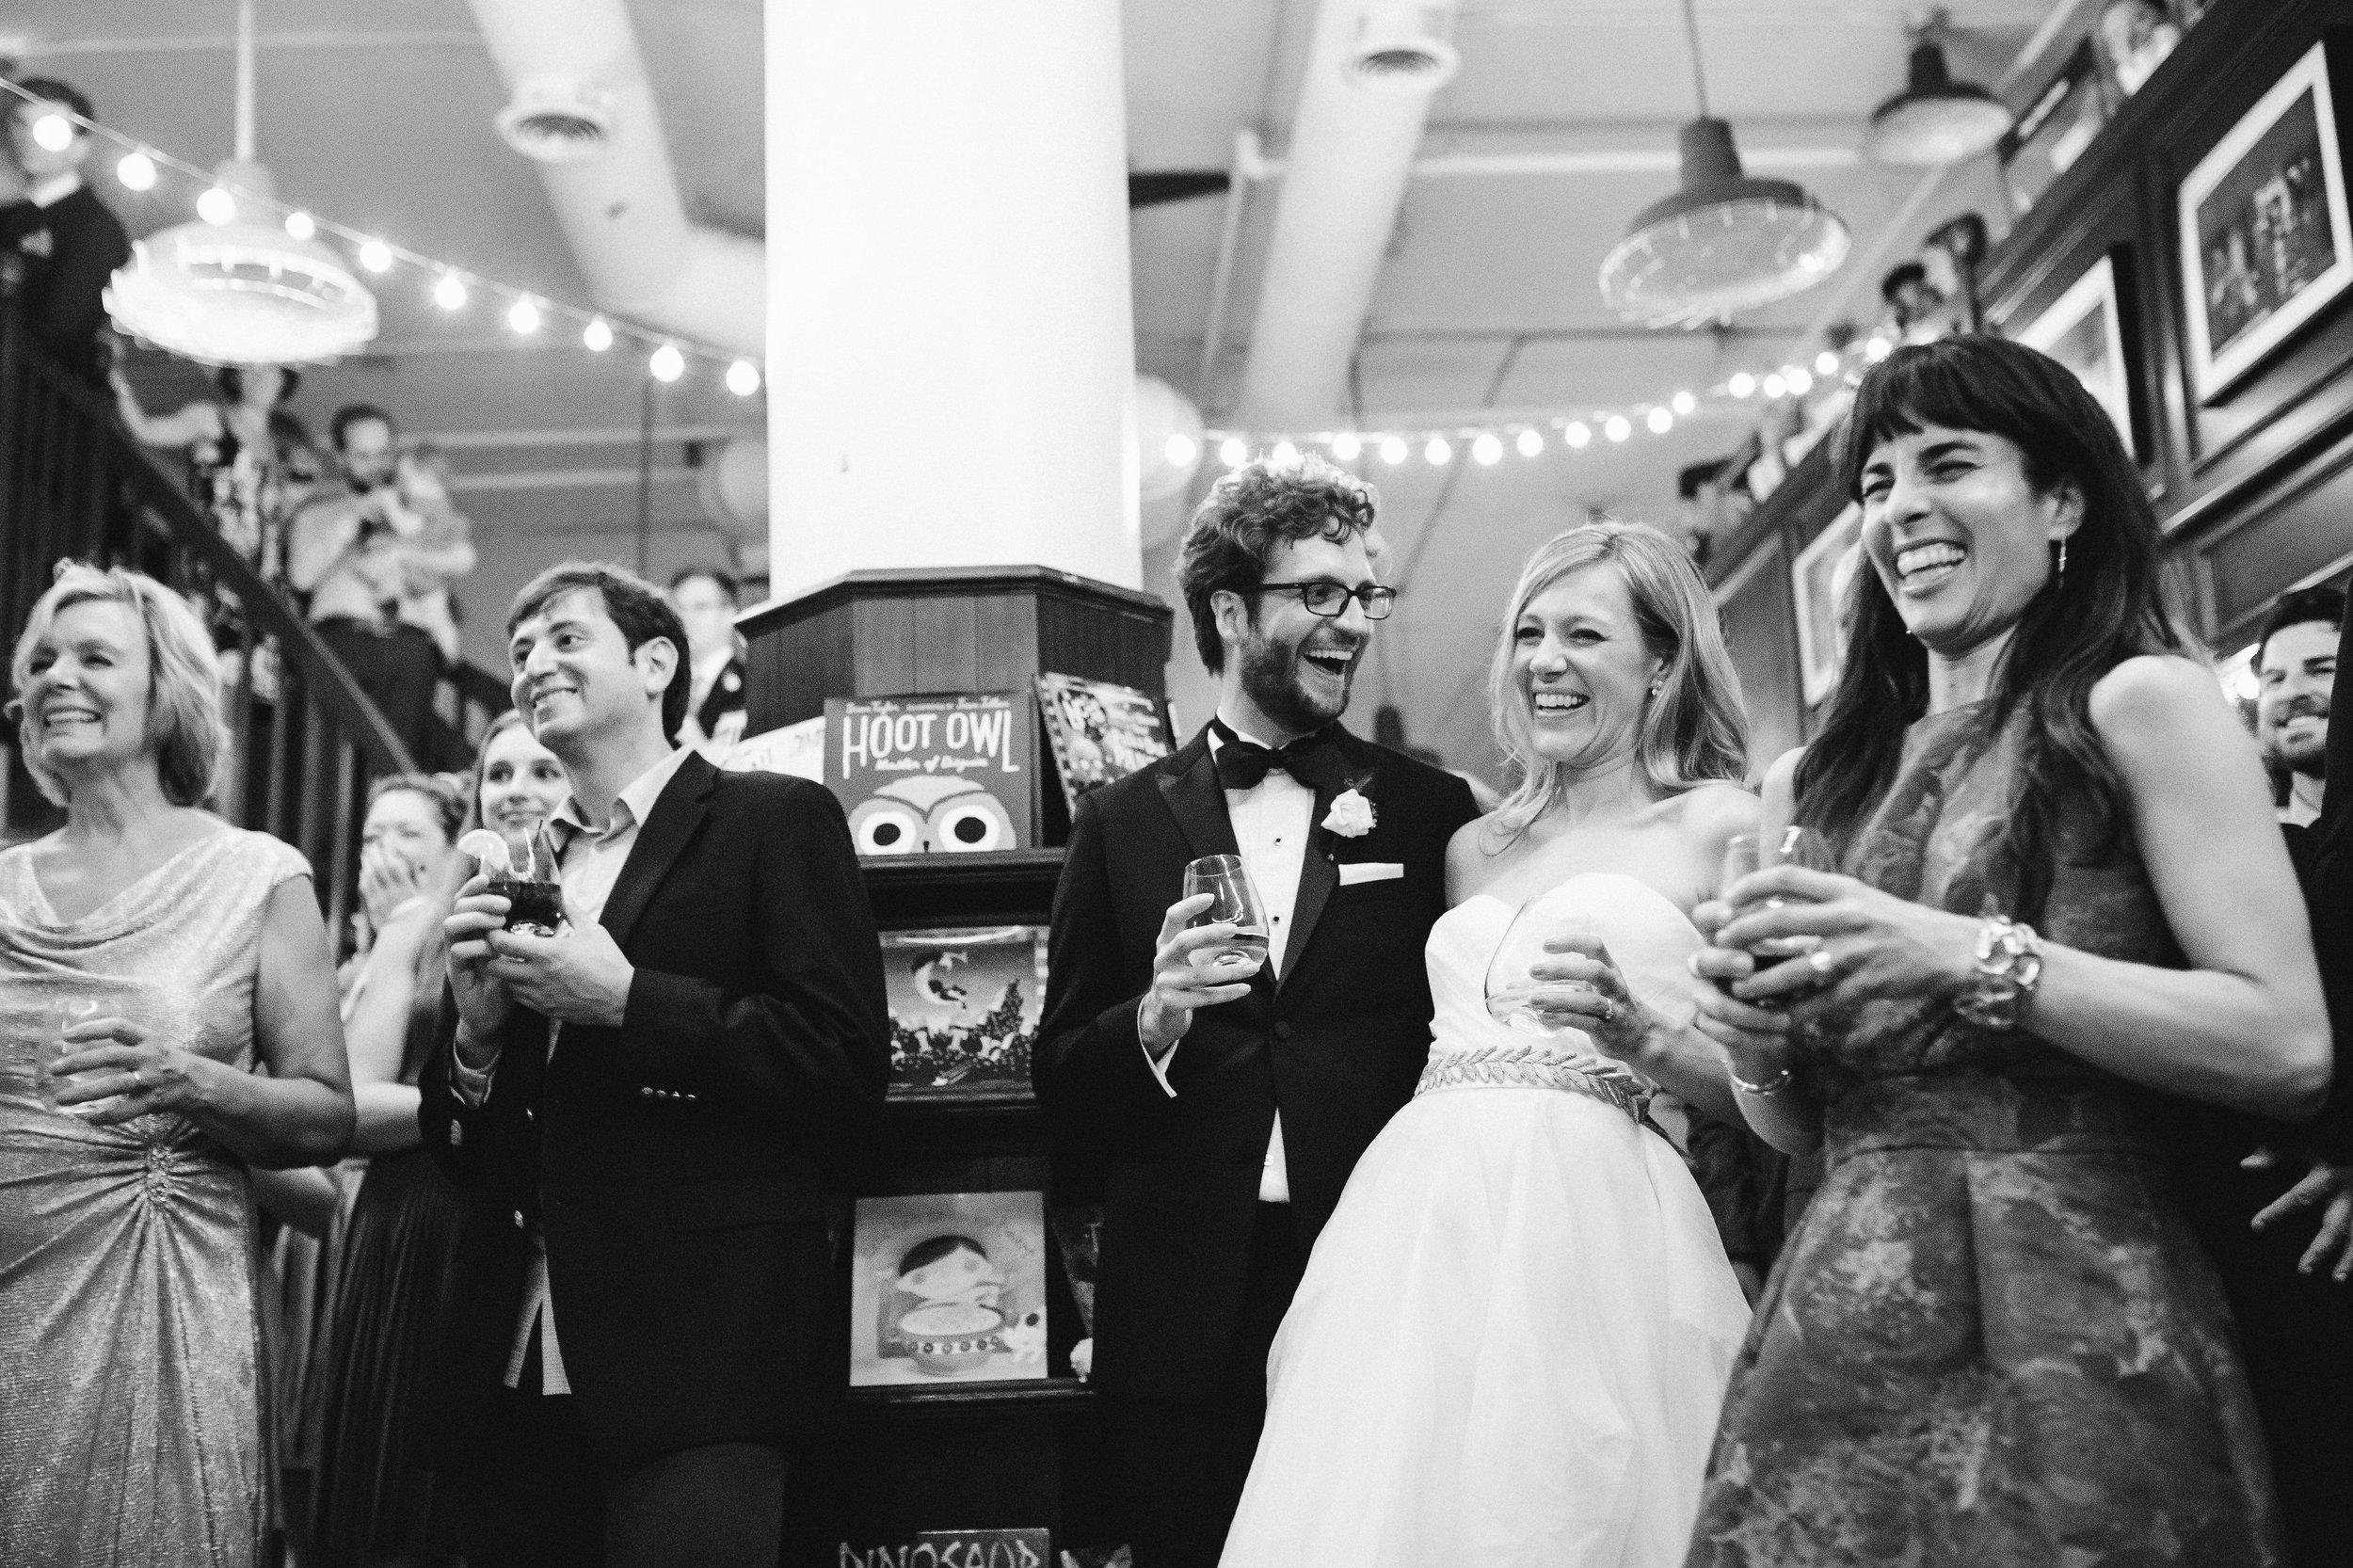 soho-nyc-new-york-wedding-photography-91.jpg